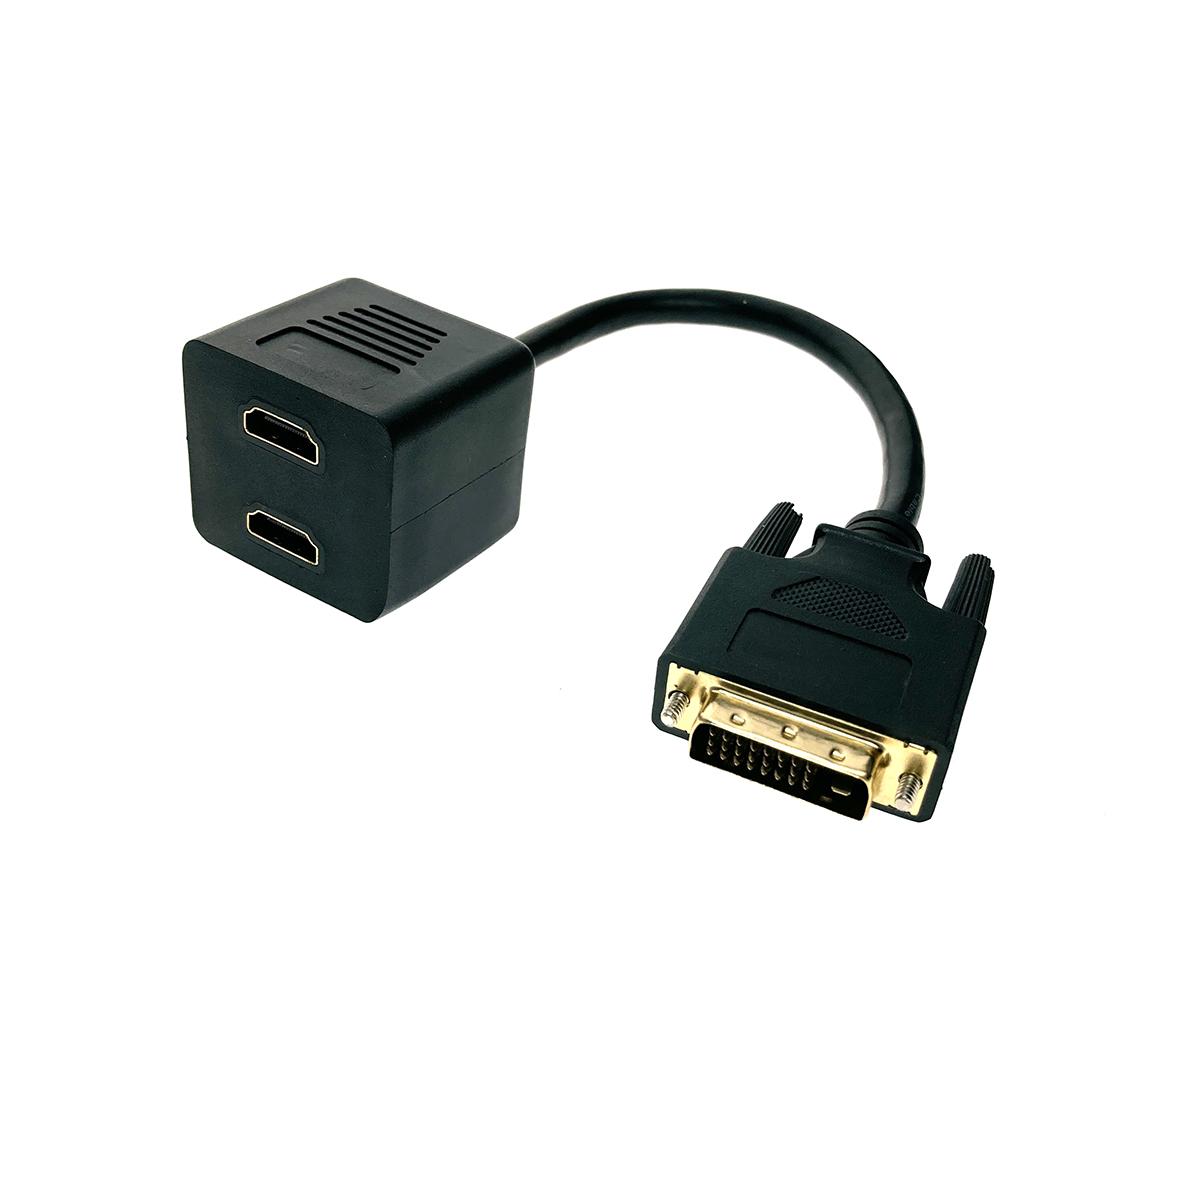 Разветвитель DVI-D 25 pin male to 2*HDMI 19 pin female 25cm ESPADA EDVIM2xHDMIF25